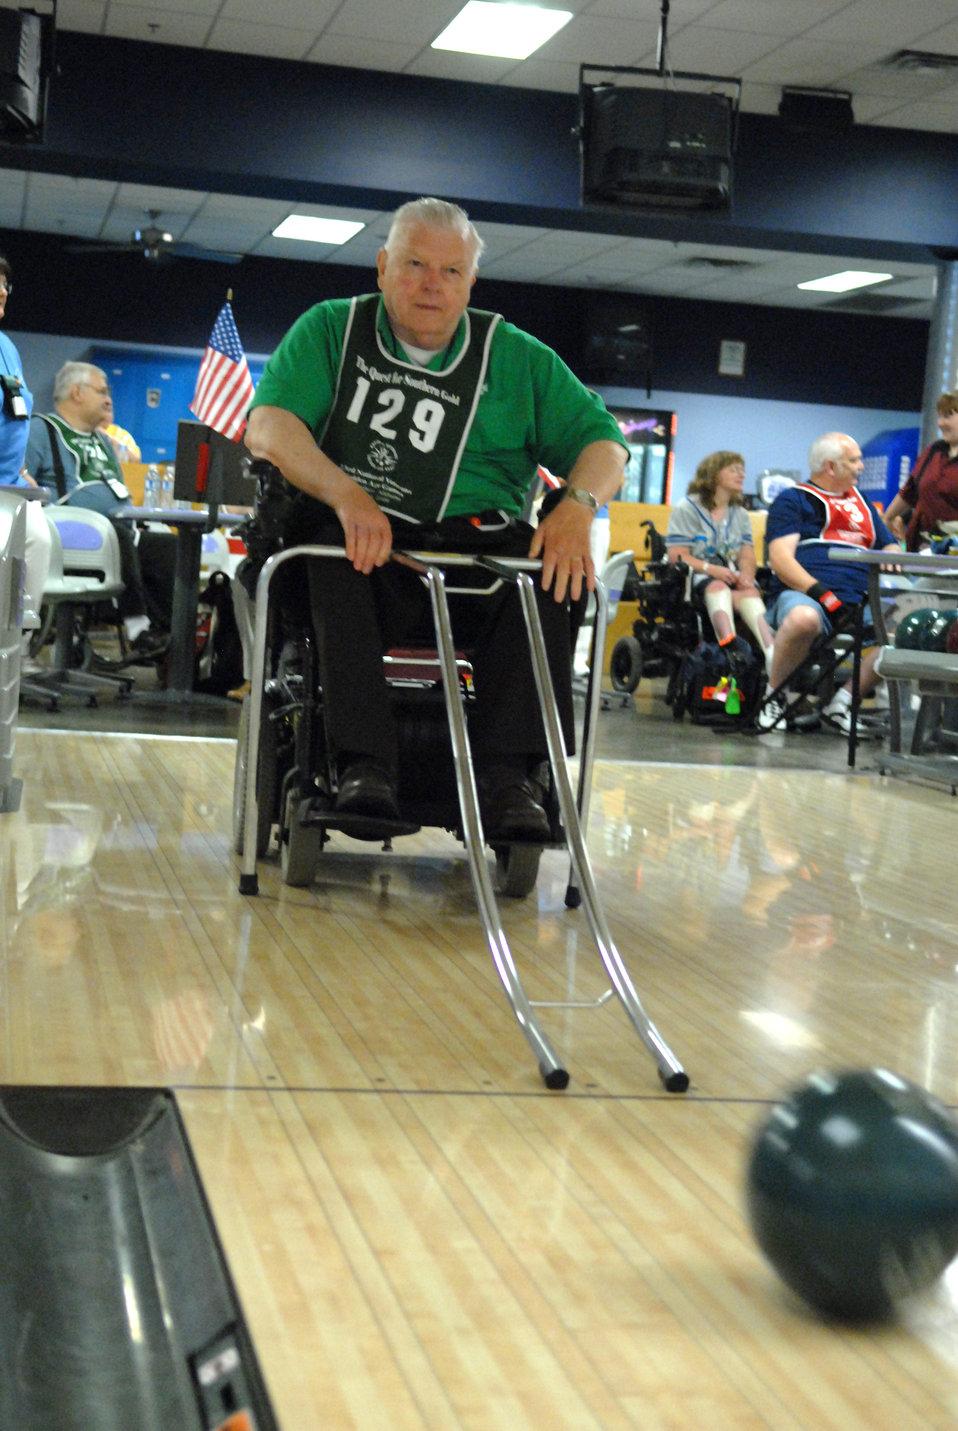 VA National Veterans Golden Age Games